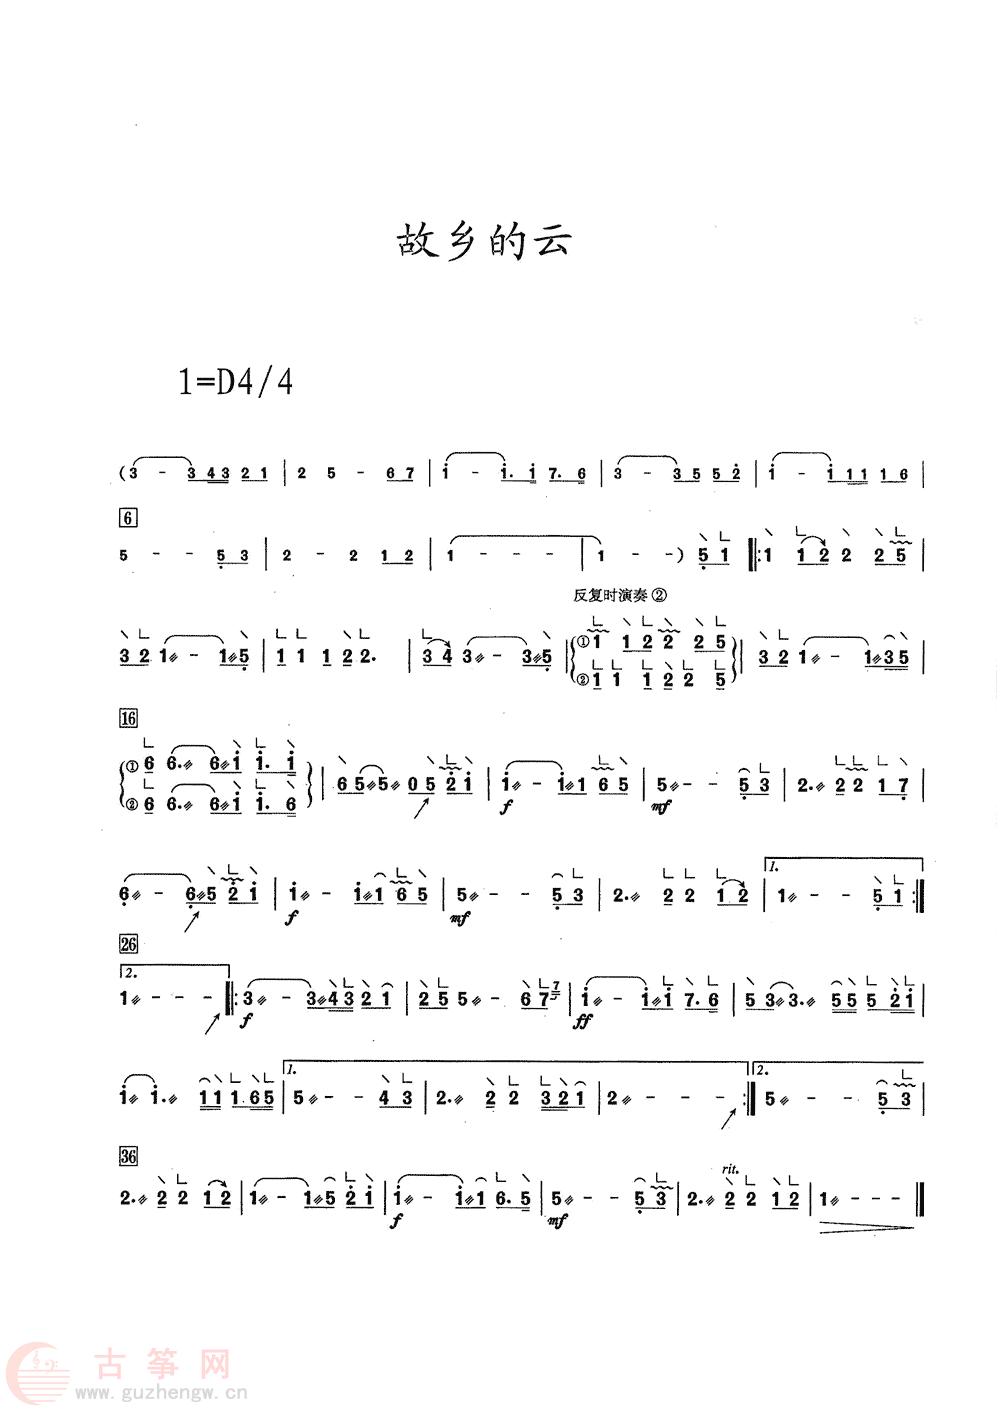 a调古筝渔舟唱晚谱子-故乡的云是文章在台湾首唱的并在台湾流行.1987年春晚邀请费翔来大